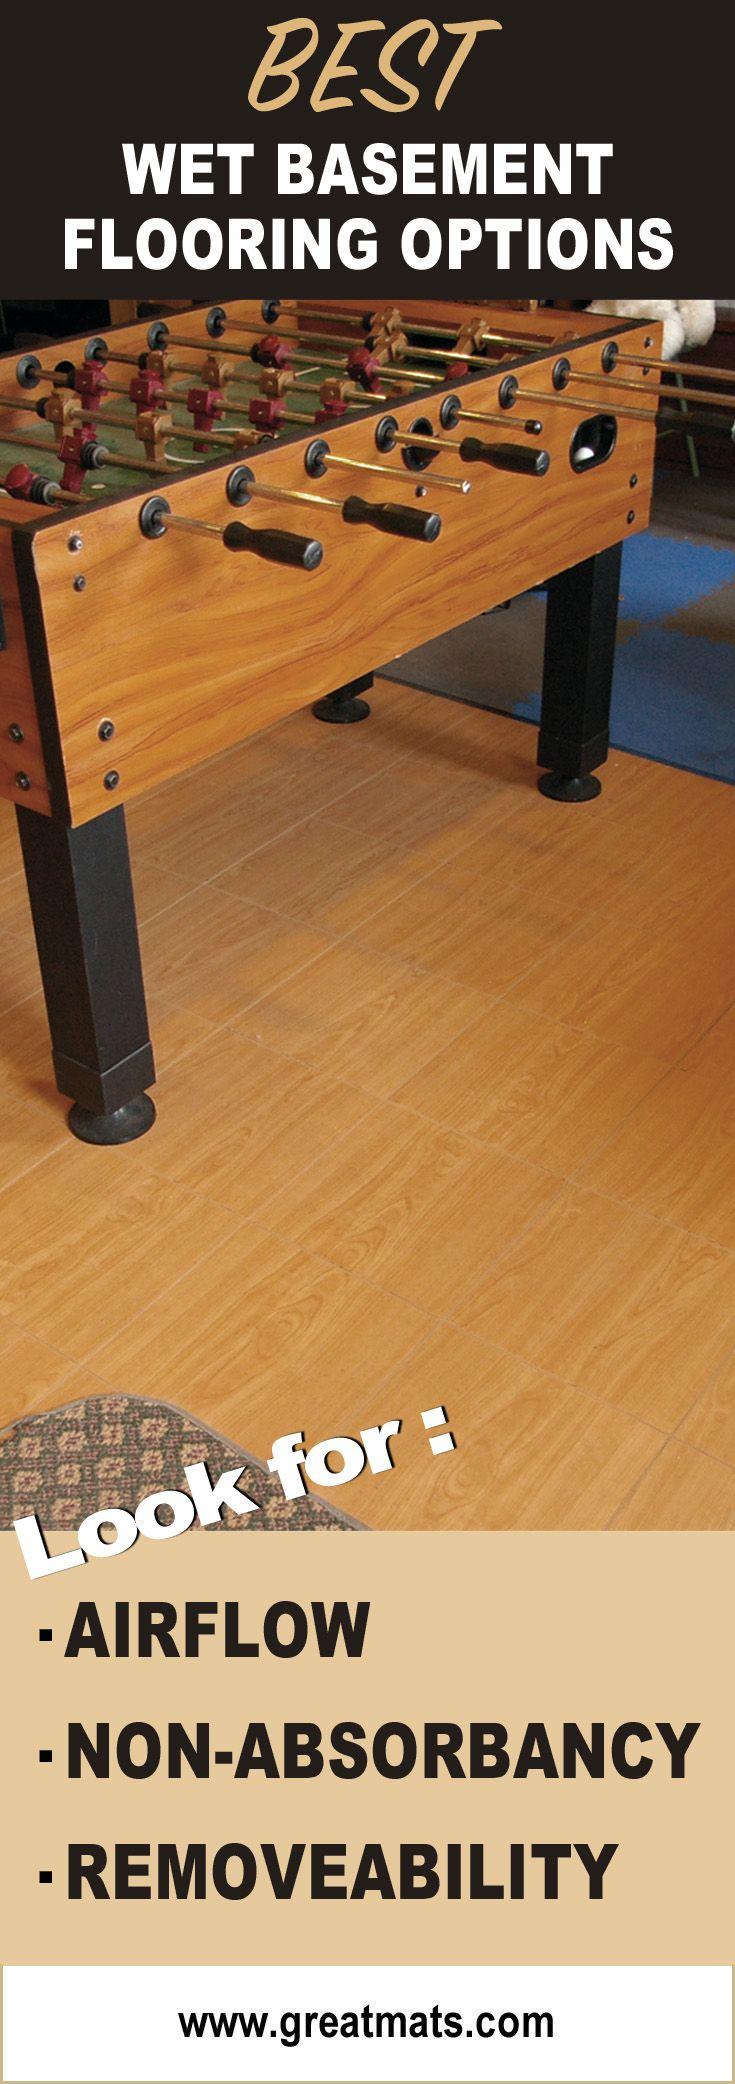 Basement flooring options for wet basements - Raised Floor Tiles For Damp Basements Raised Flooring For Damp Basements Moisture Proof Basement Flooring Options And Ideas Use In Basement Flooring